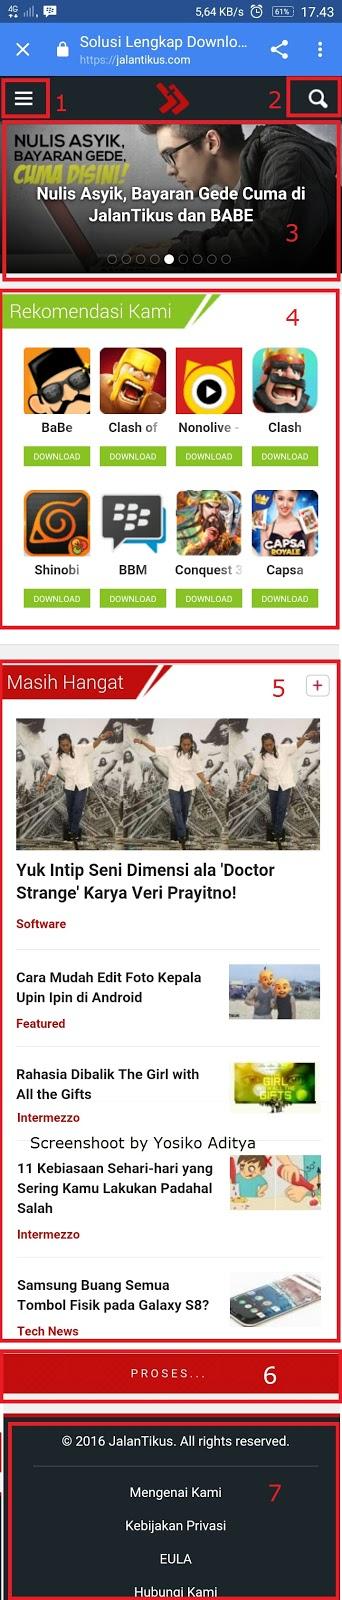 Review JalanTikus.com - Situs Teknologi no1 di Indonesia 8